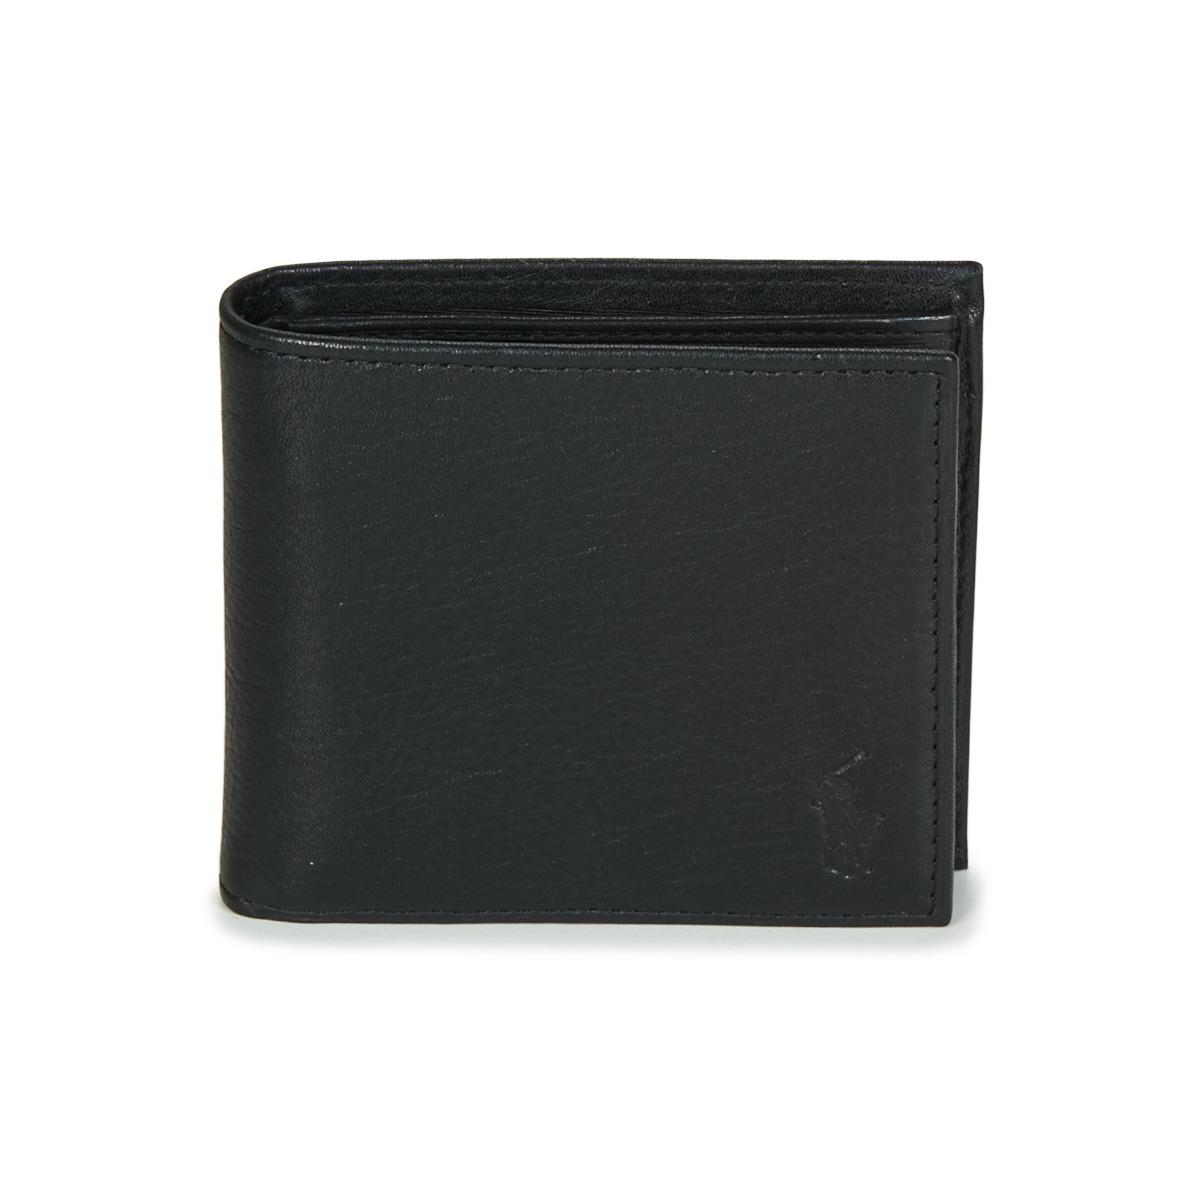 Tegnebøger Polo Ralph Lauren  EU BILL W/ C-WALLET-SMOOTH LEATHER